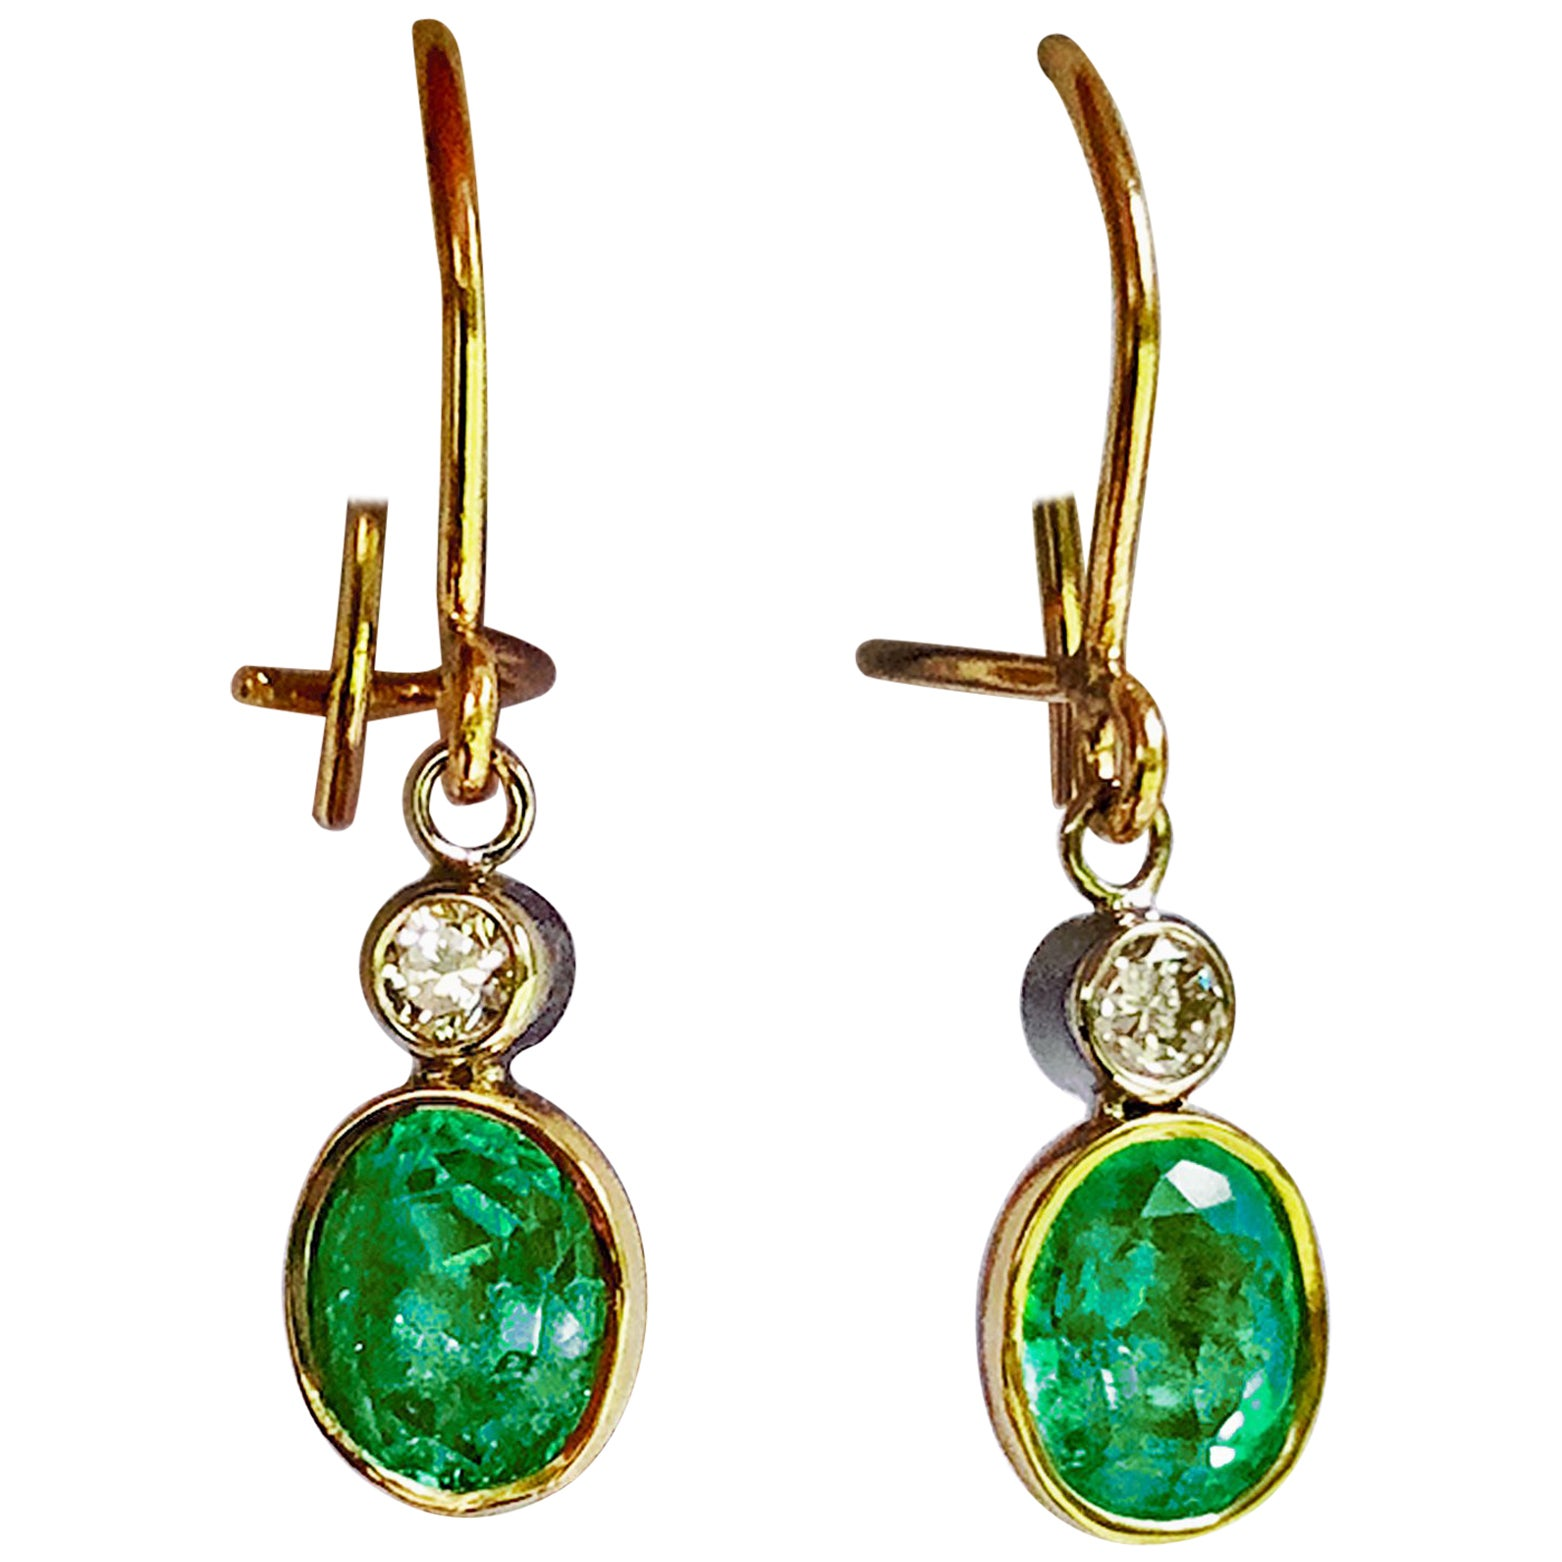 2.60 Carat Natural Colombian Emerald Diamond Drop Earrings 18 Karat Gold